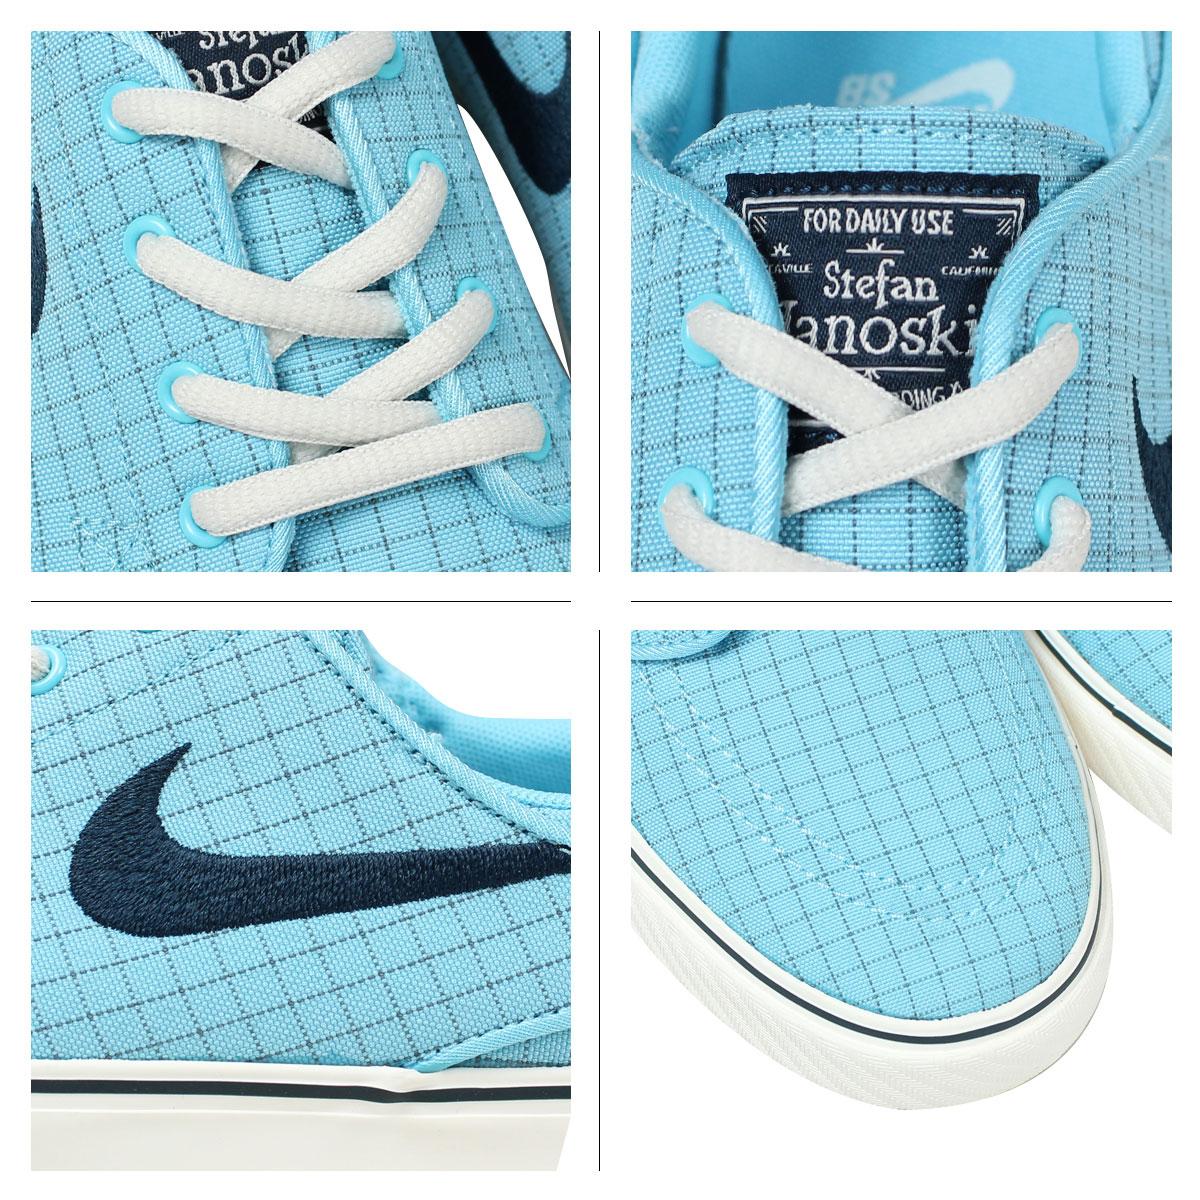 Nike NIKE SB ステファンジャノスキレディーススニーカー STEFAN JANOSKI PREM CNVS GS 654,862 440 blue